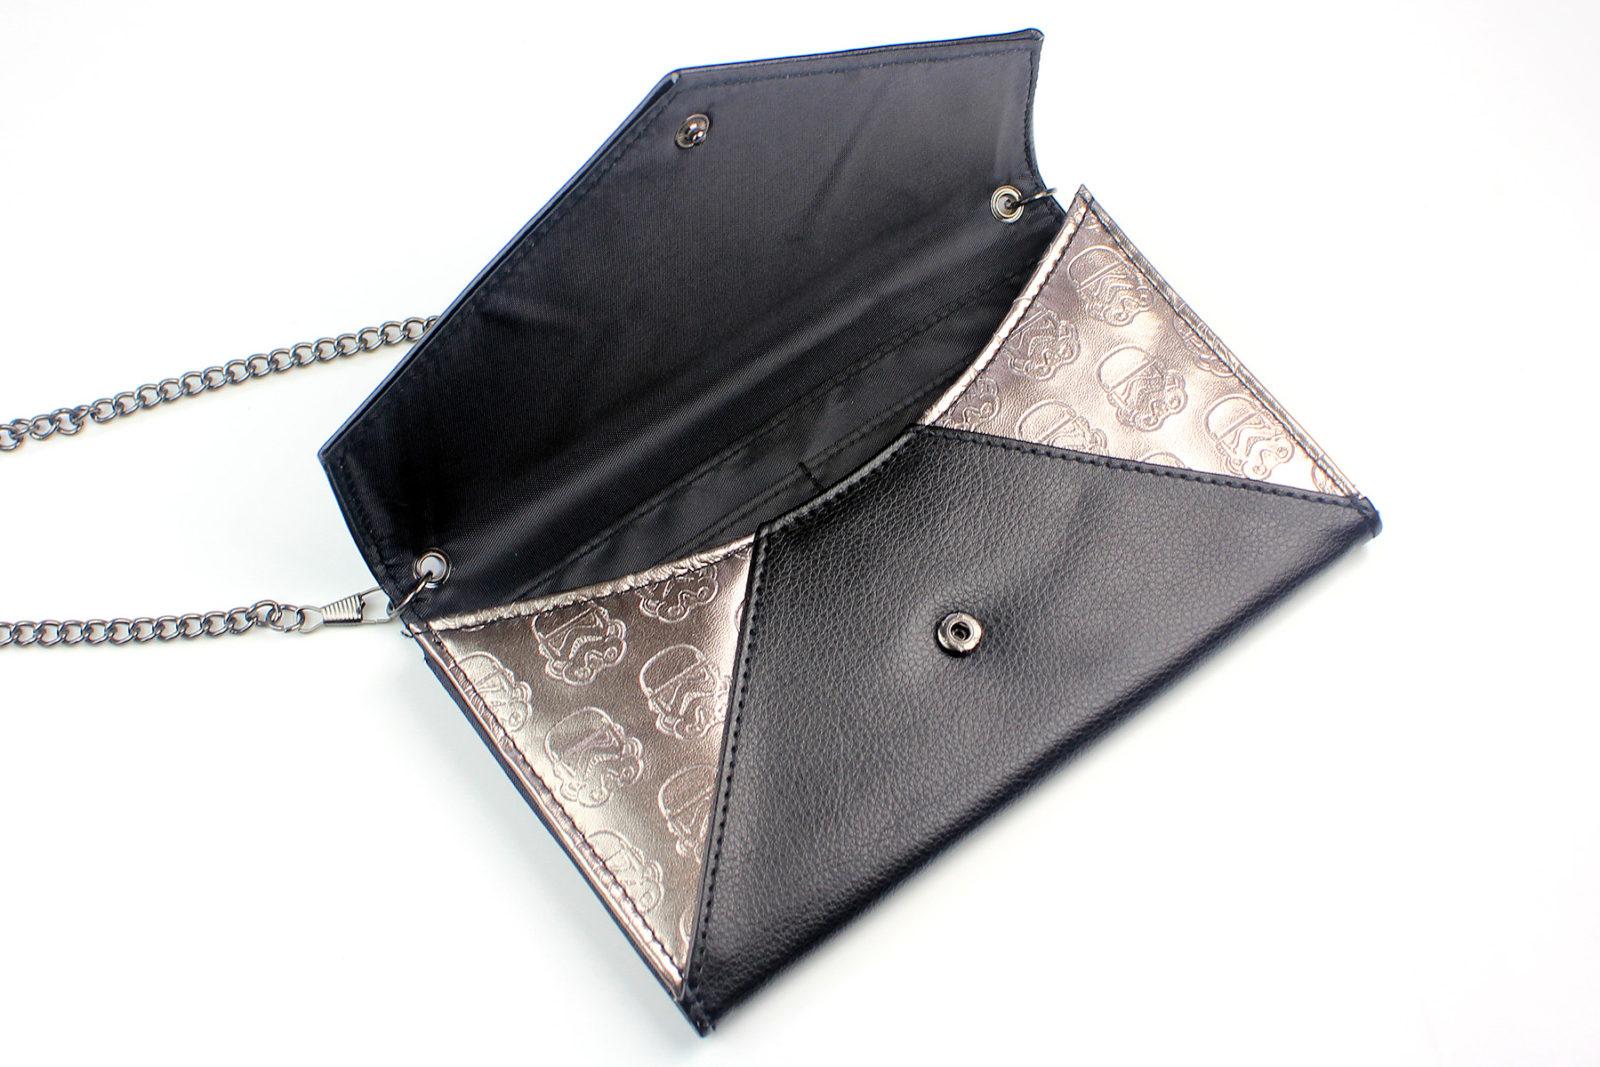 Bioworld - Galactic Empire envelope chain wallet (front/interior)